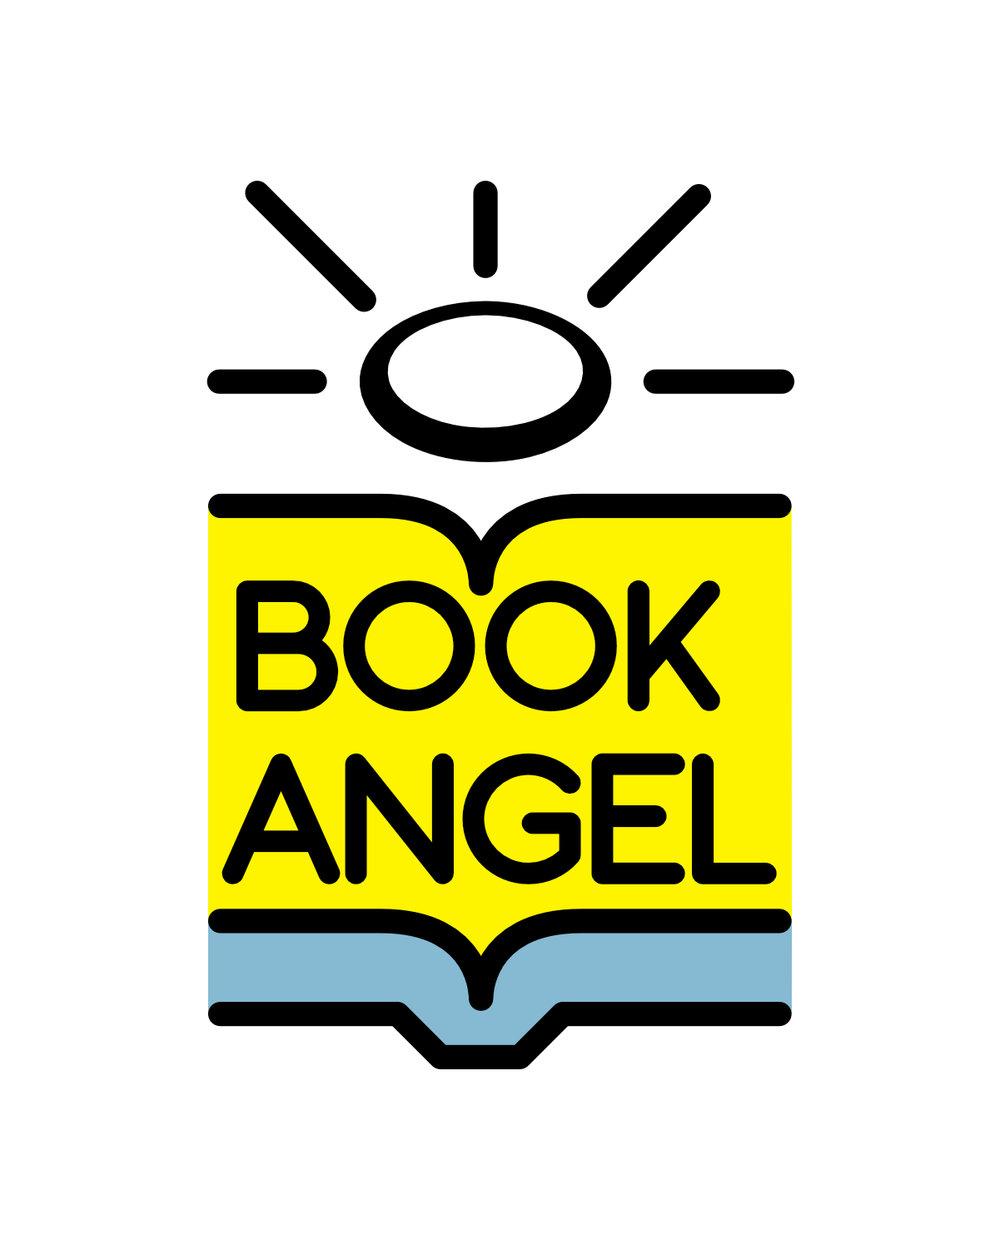 Book Angel logo-singlecolor.jpg